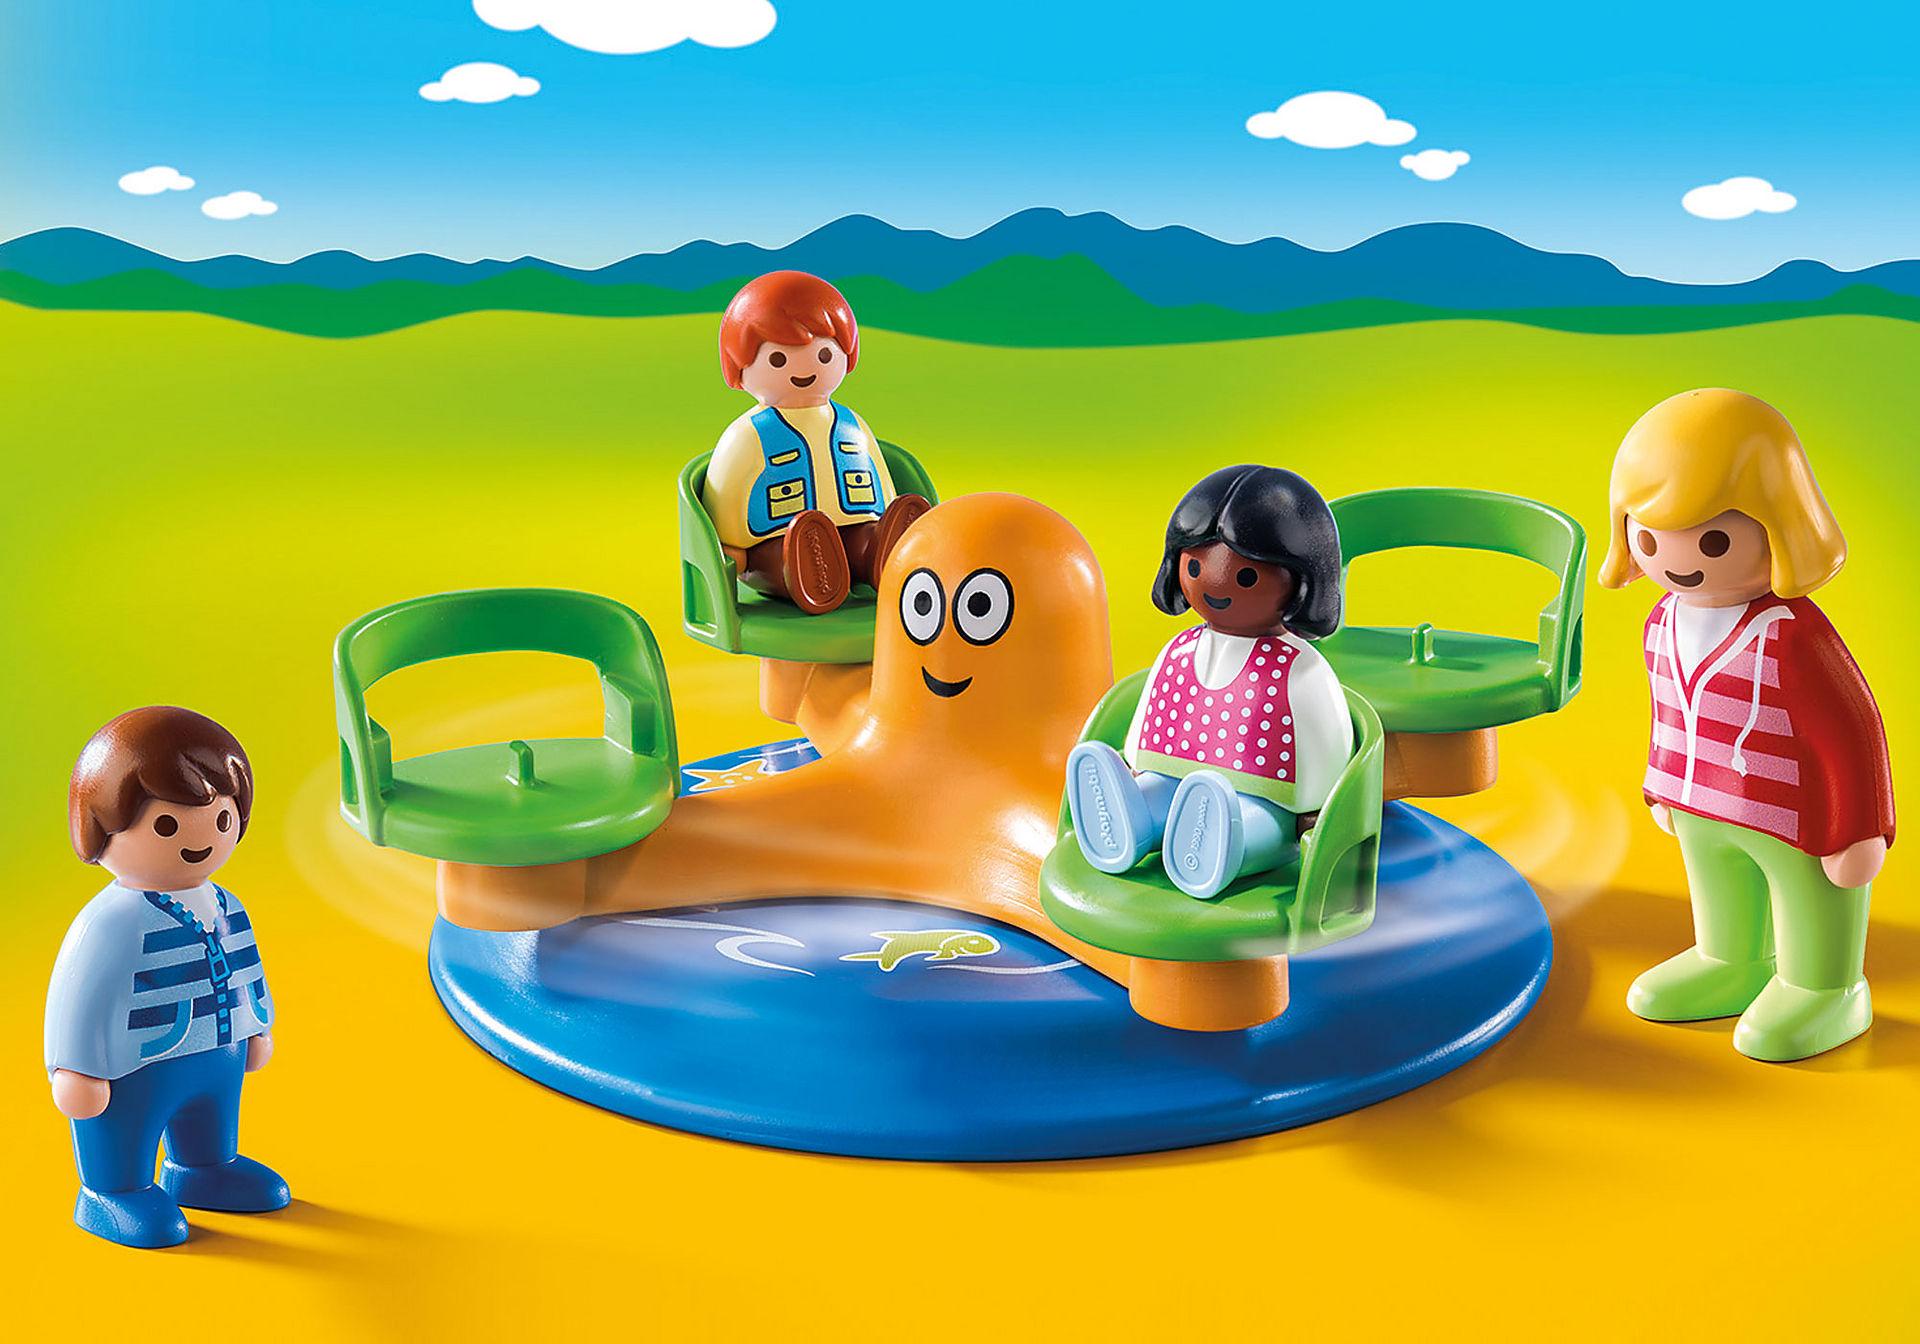 http://media.playmobil.com/i/playmobil/9379_product_detail/1.2.3 Carrusel Infantil